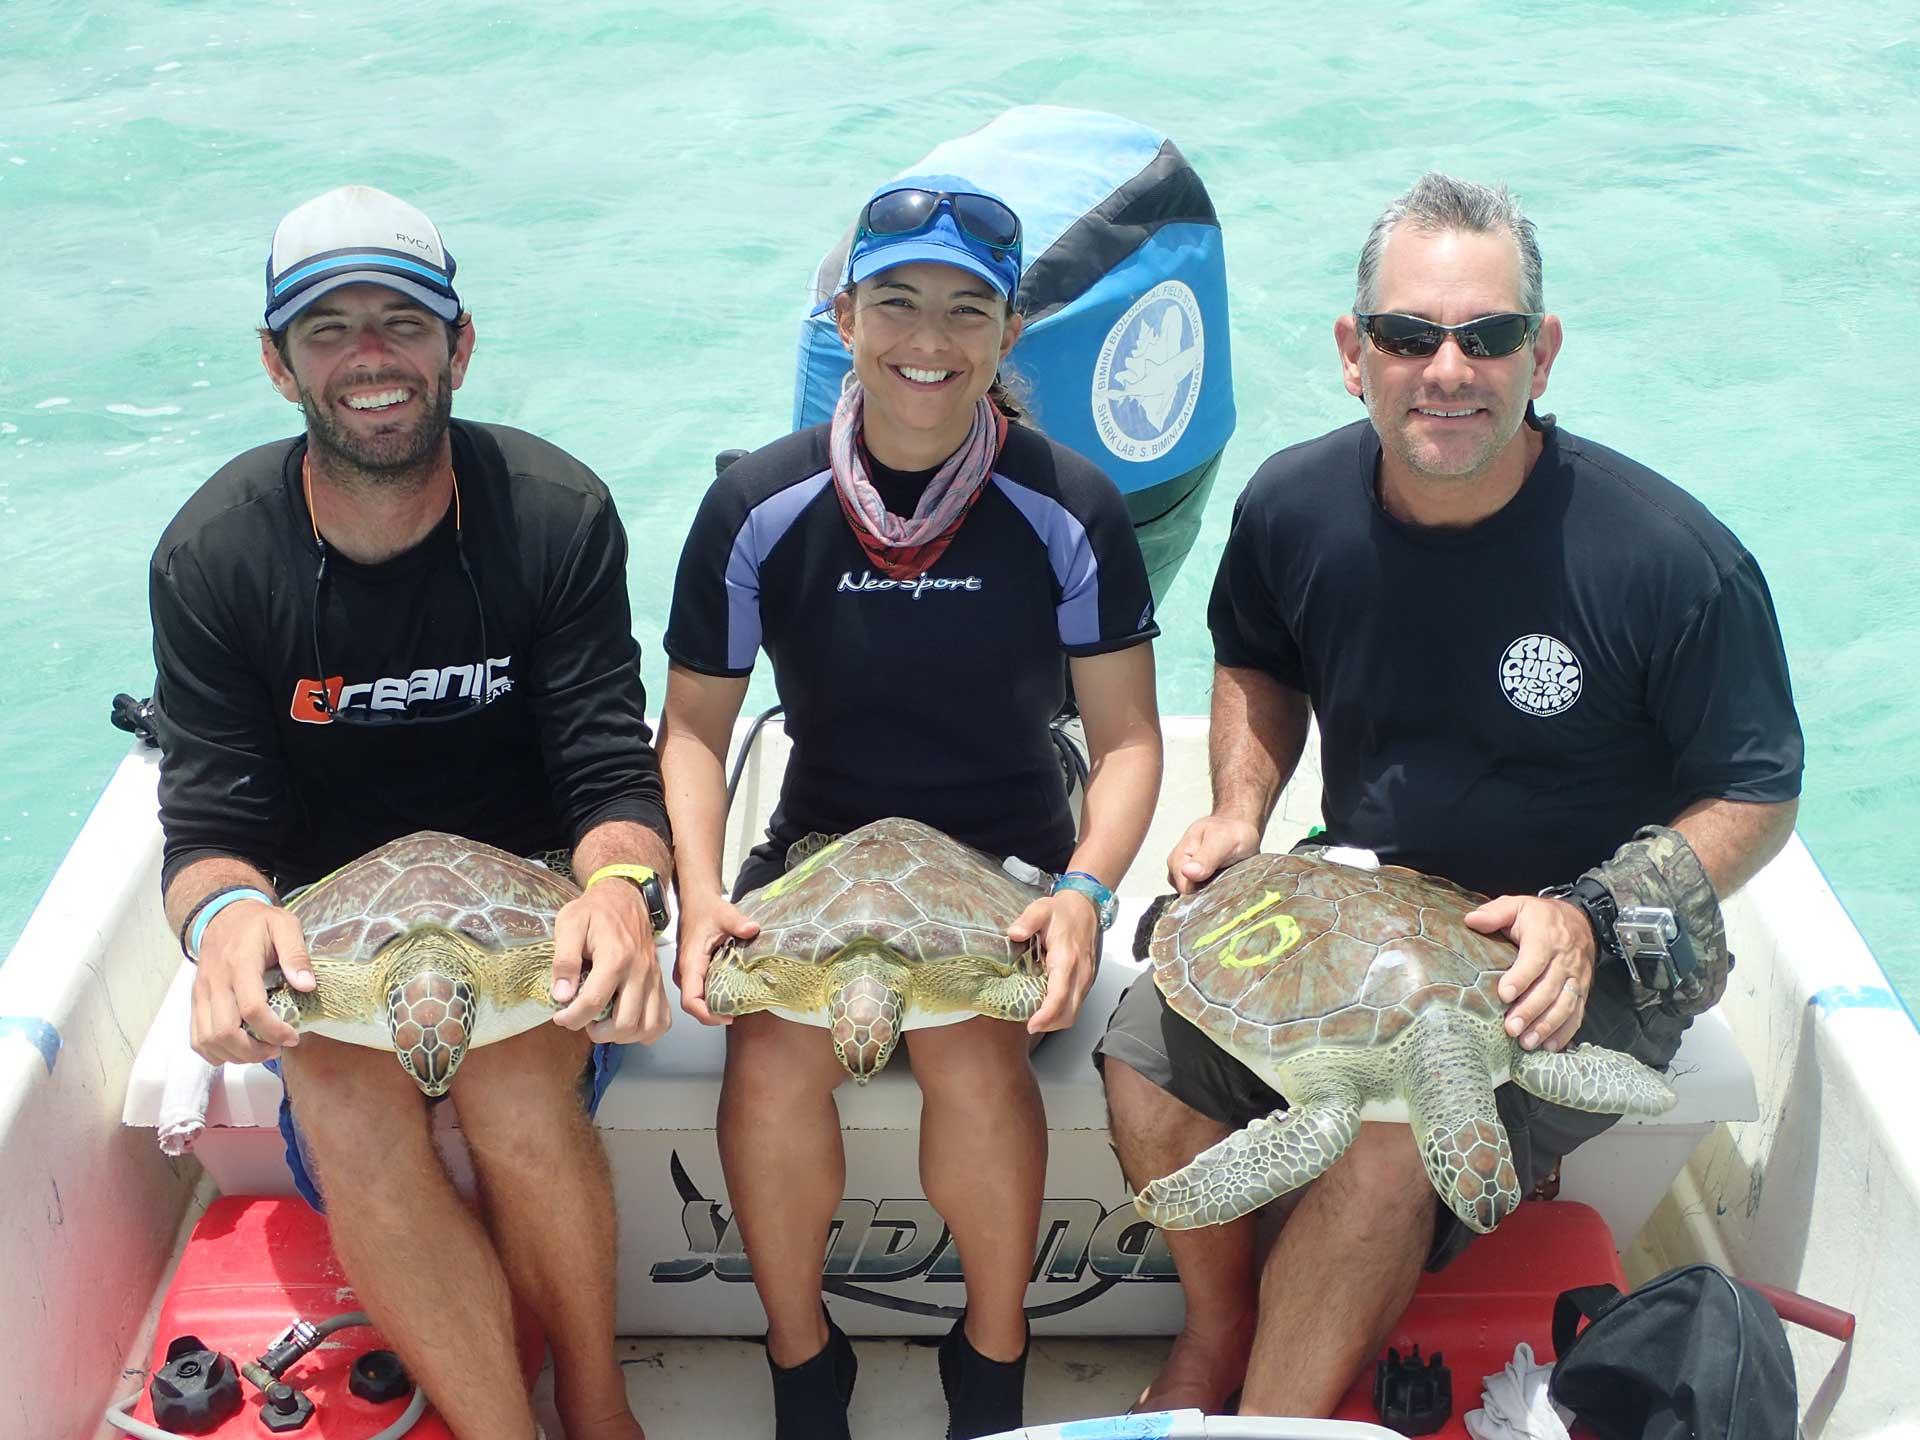 FUENTESmariana - turtles and sharks